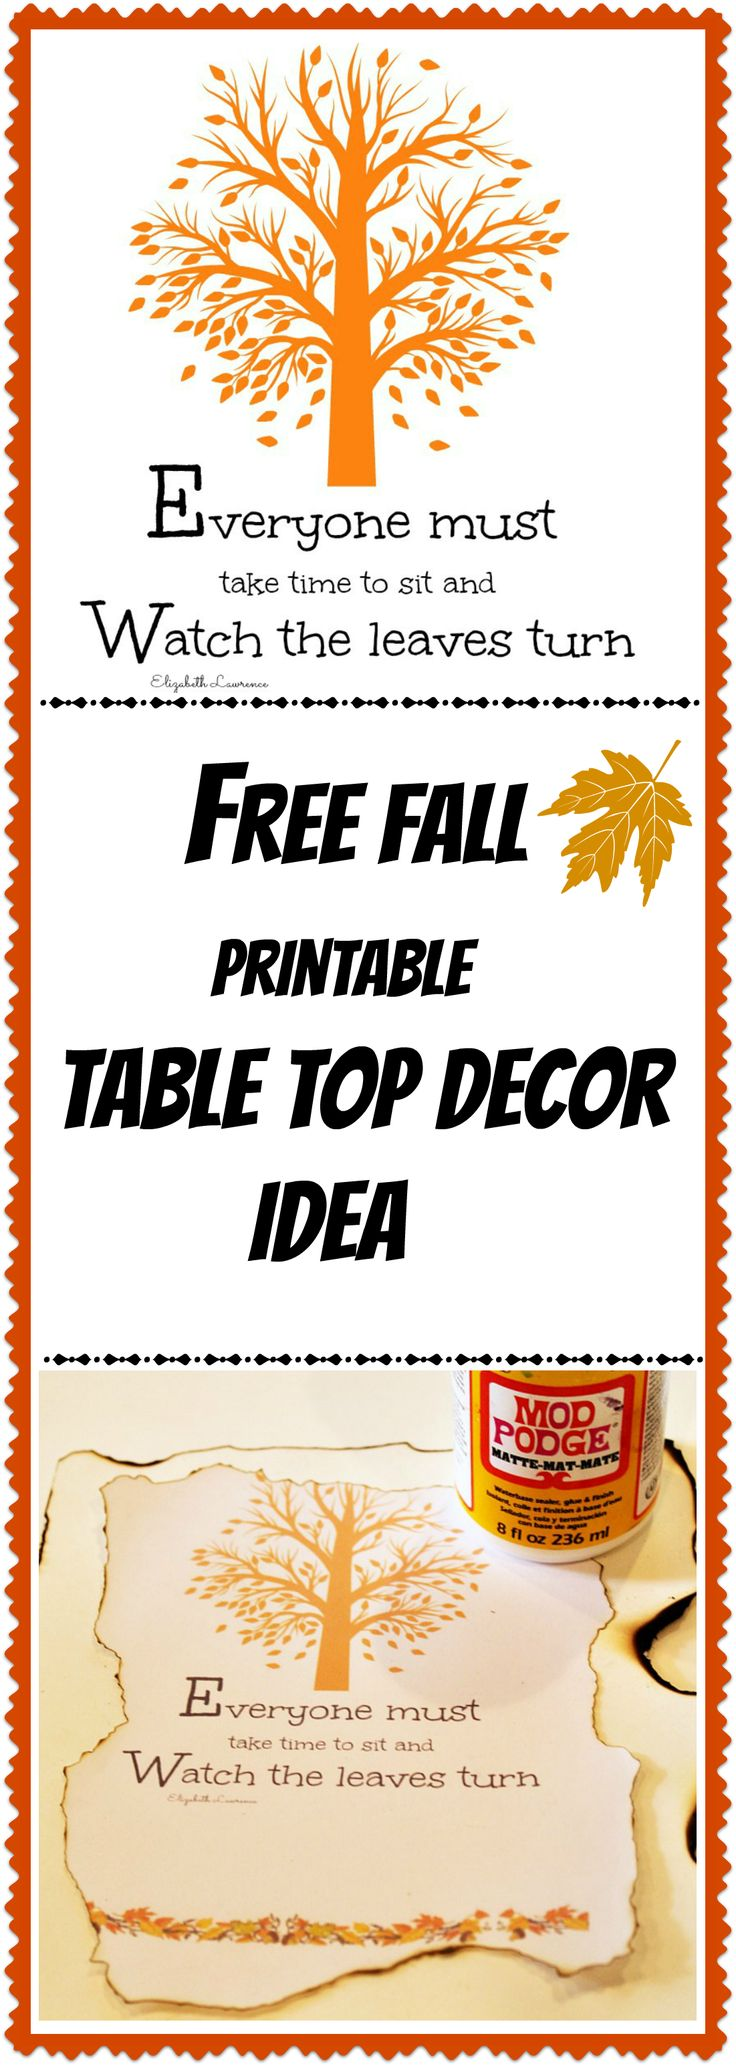 Free #fall printable diy table top decor idea